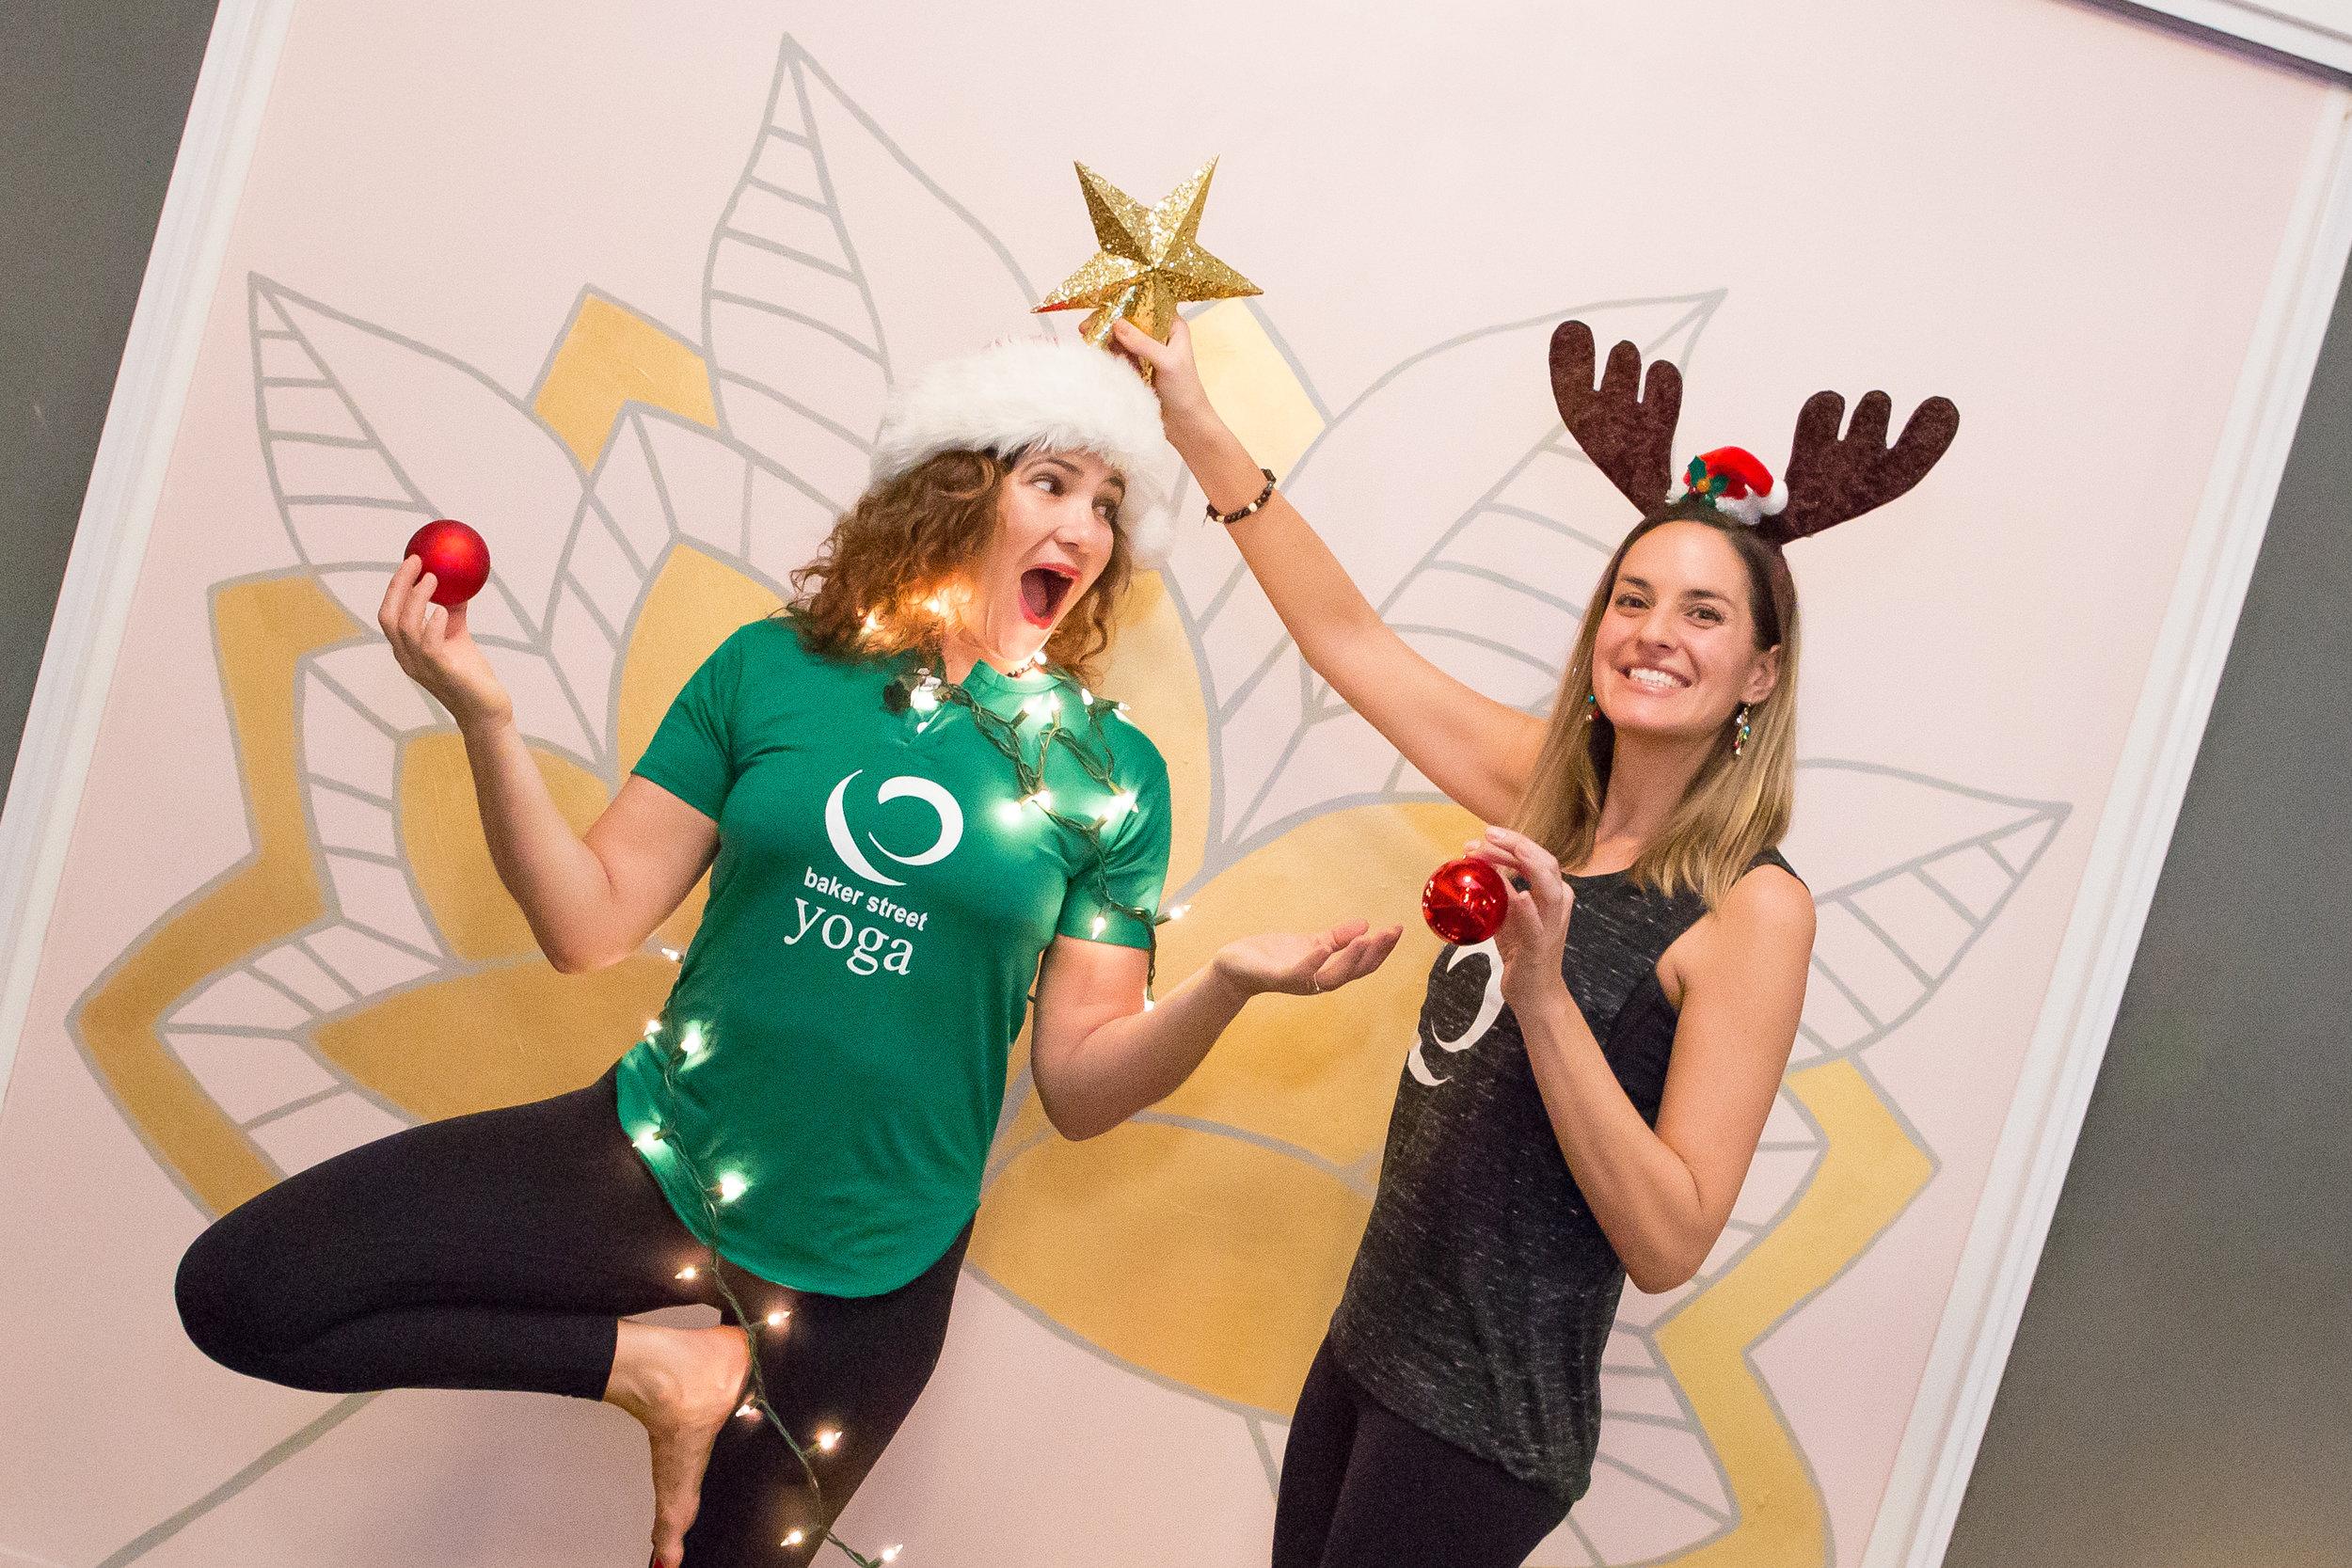 Blake Henry + Lisa Moser, Owners and Yogis, Baker Street Yoga